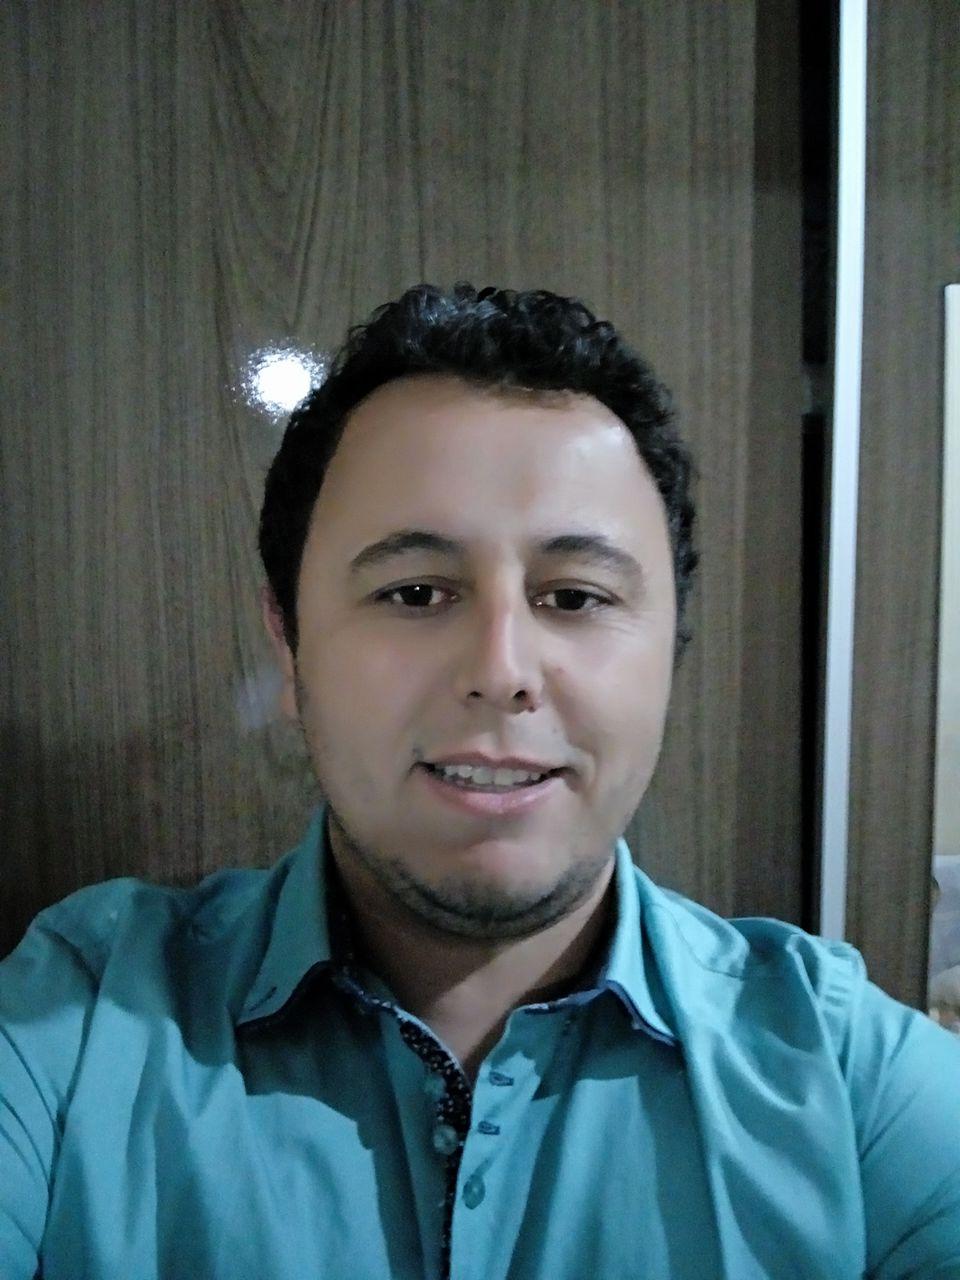 Everson Ramiro